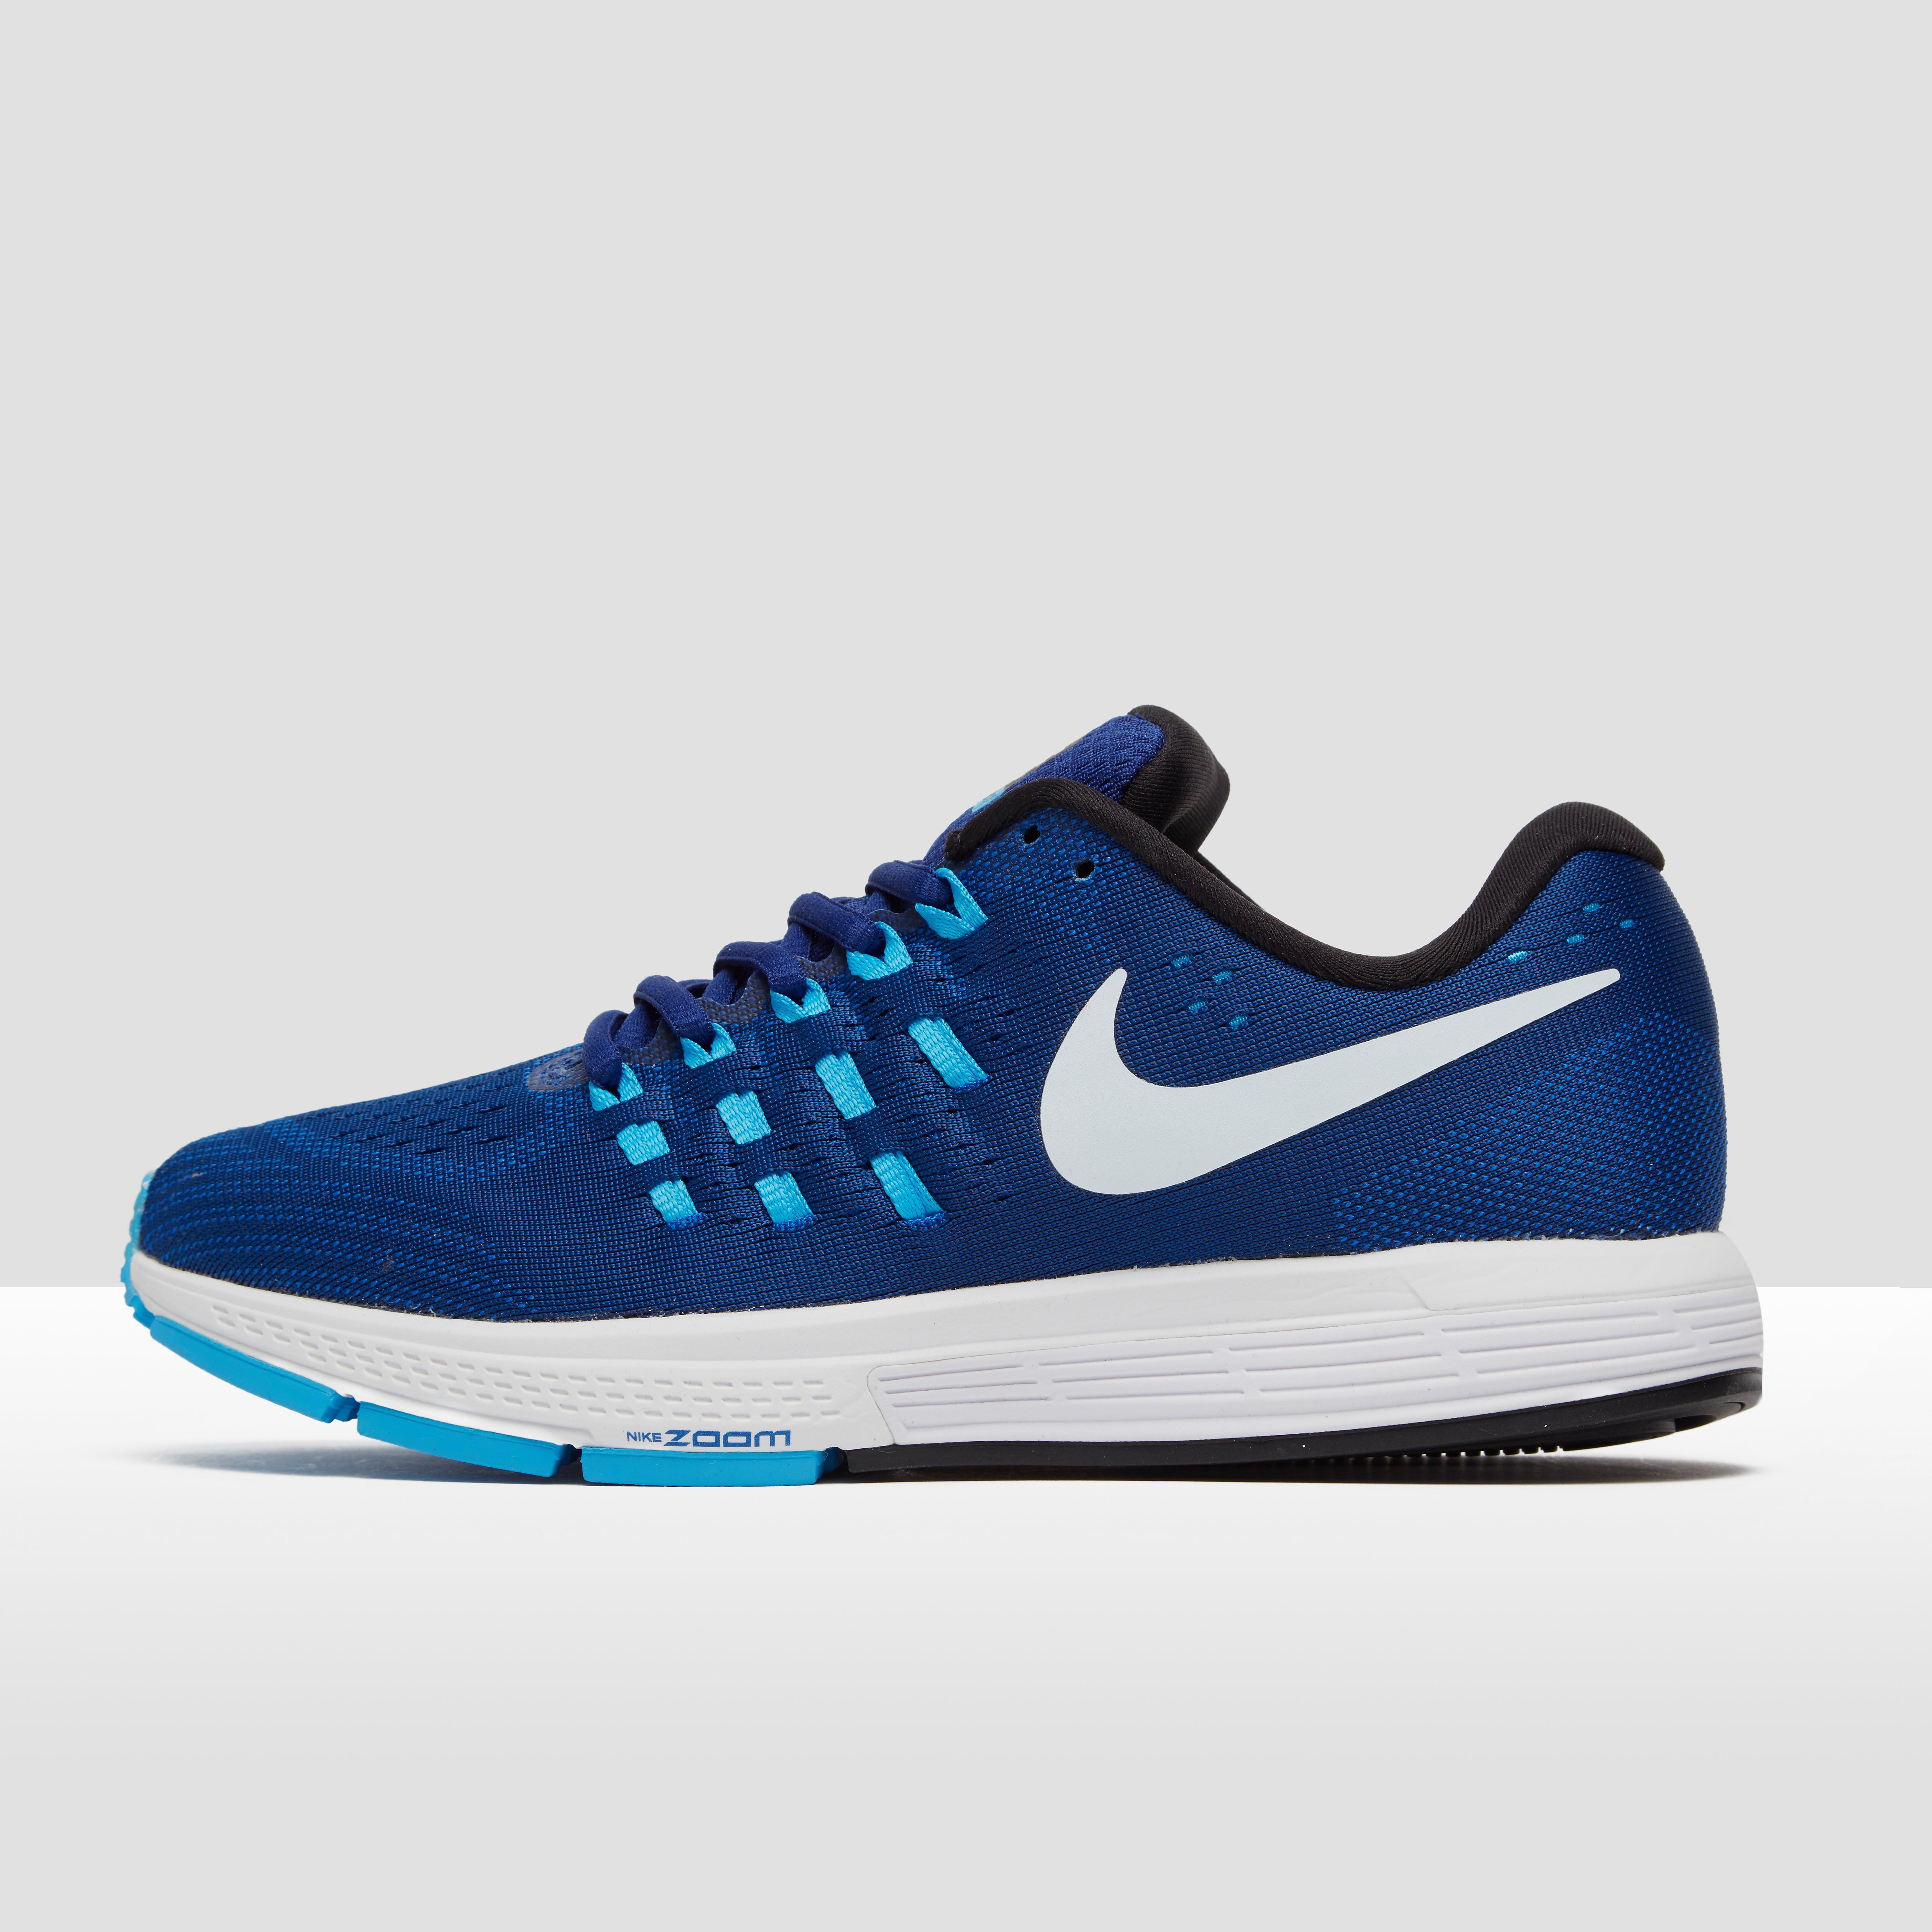 Nike ZOOM VOMERO 11 BLUE